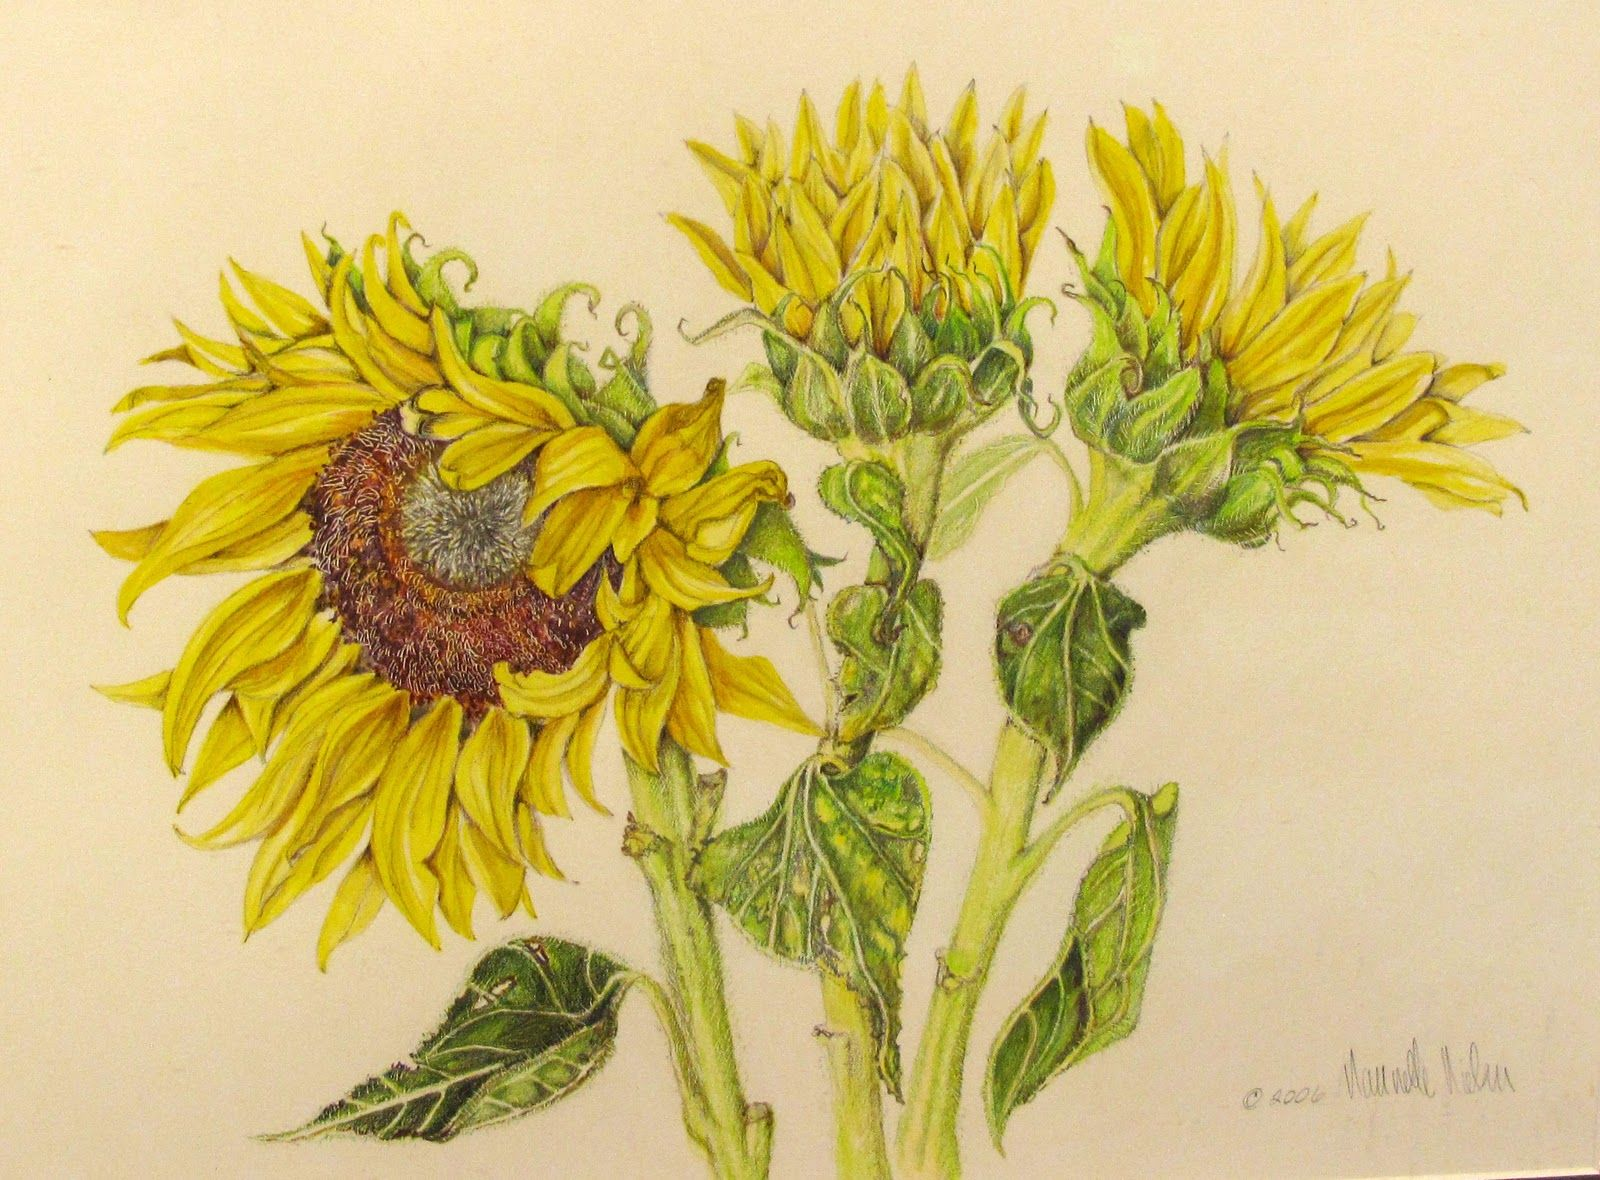 Sunflower Line Drawing : Botanical sunflower sketch tattoo design pinterest